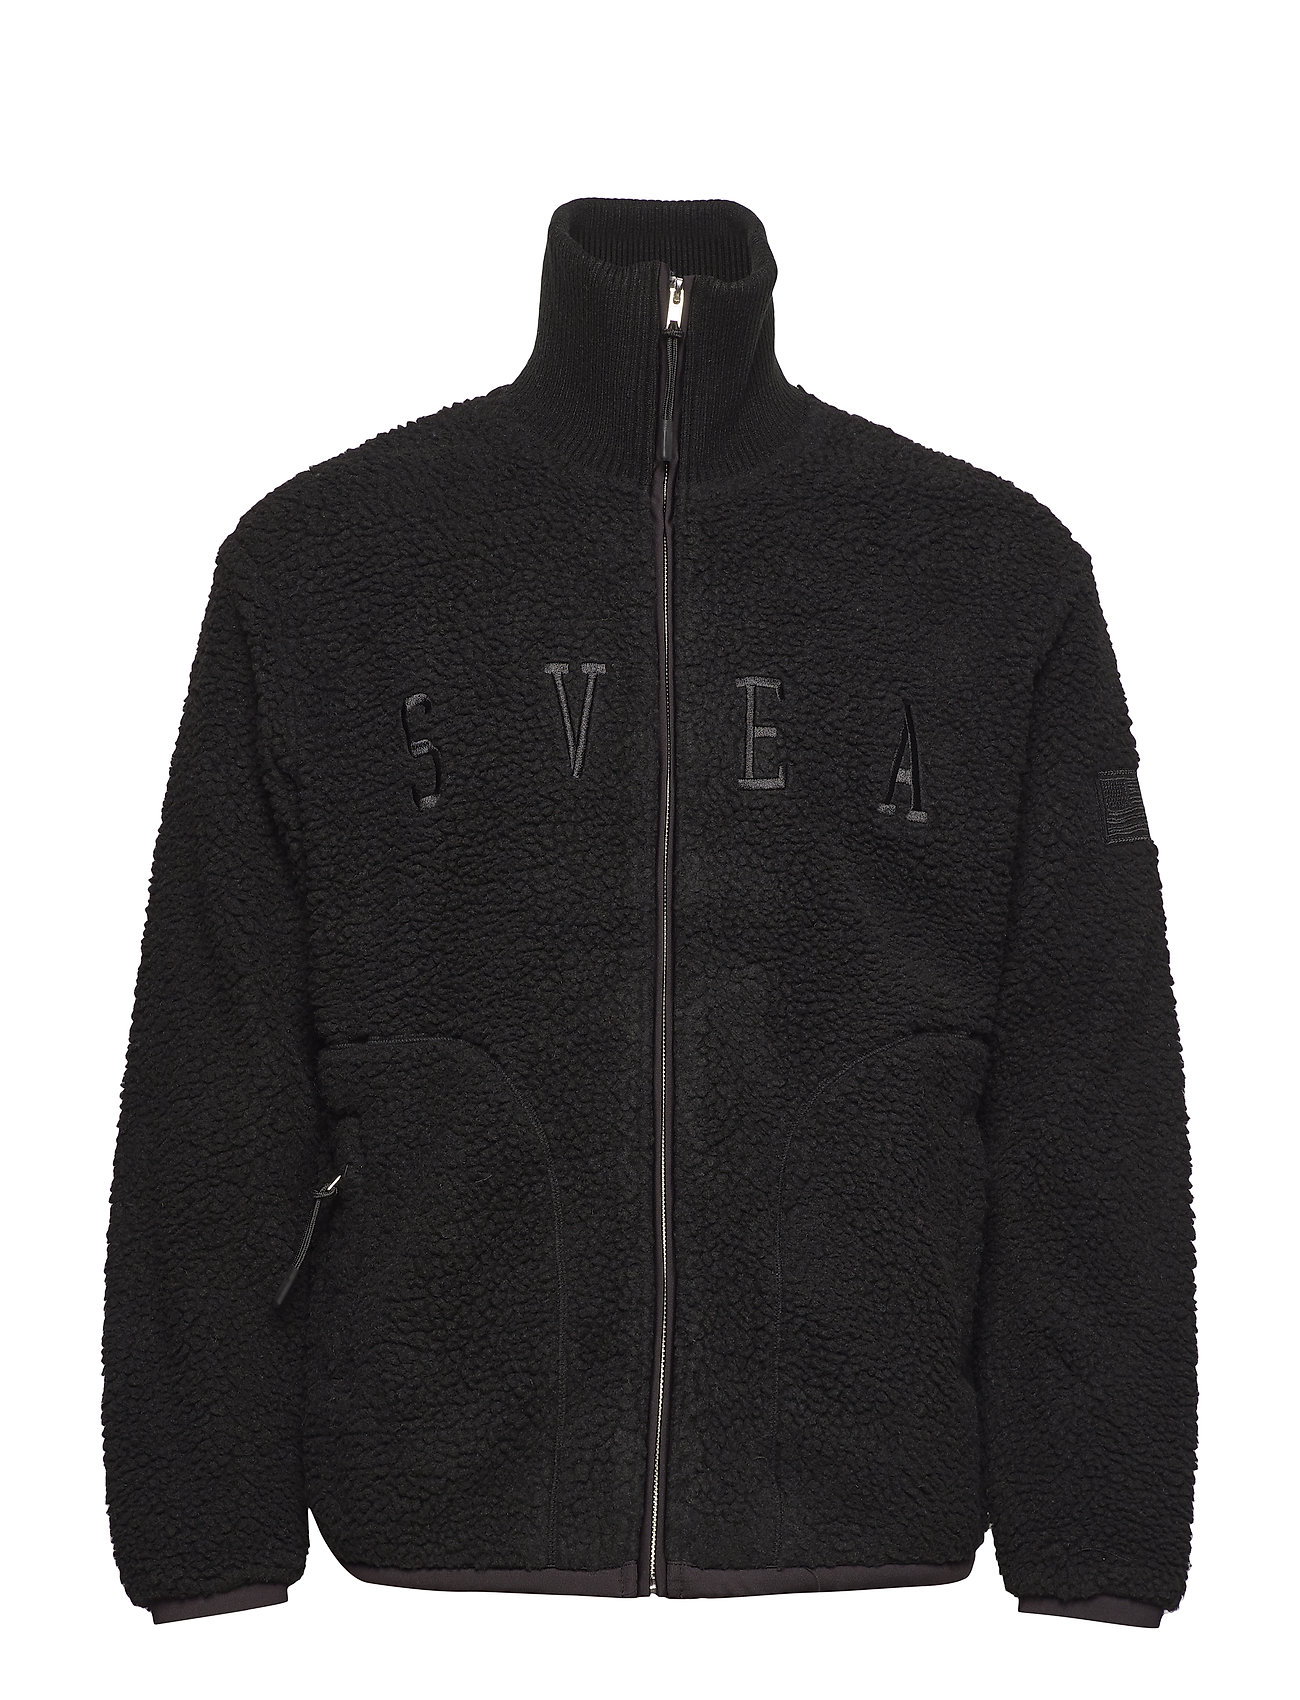 Svea Maison Pile Zip Sweater - GREY MELANGE